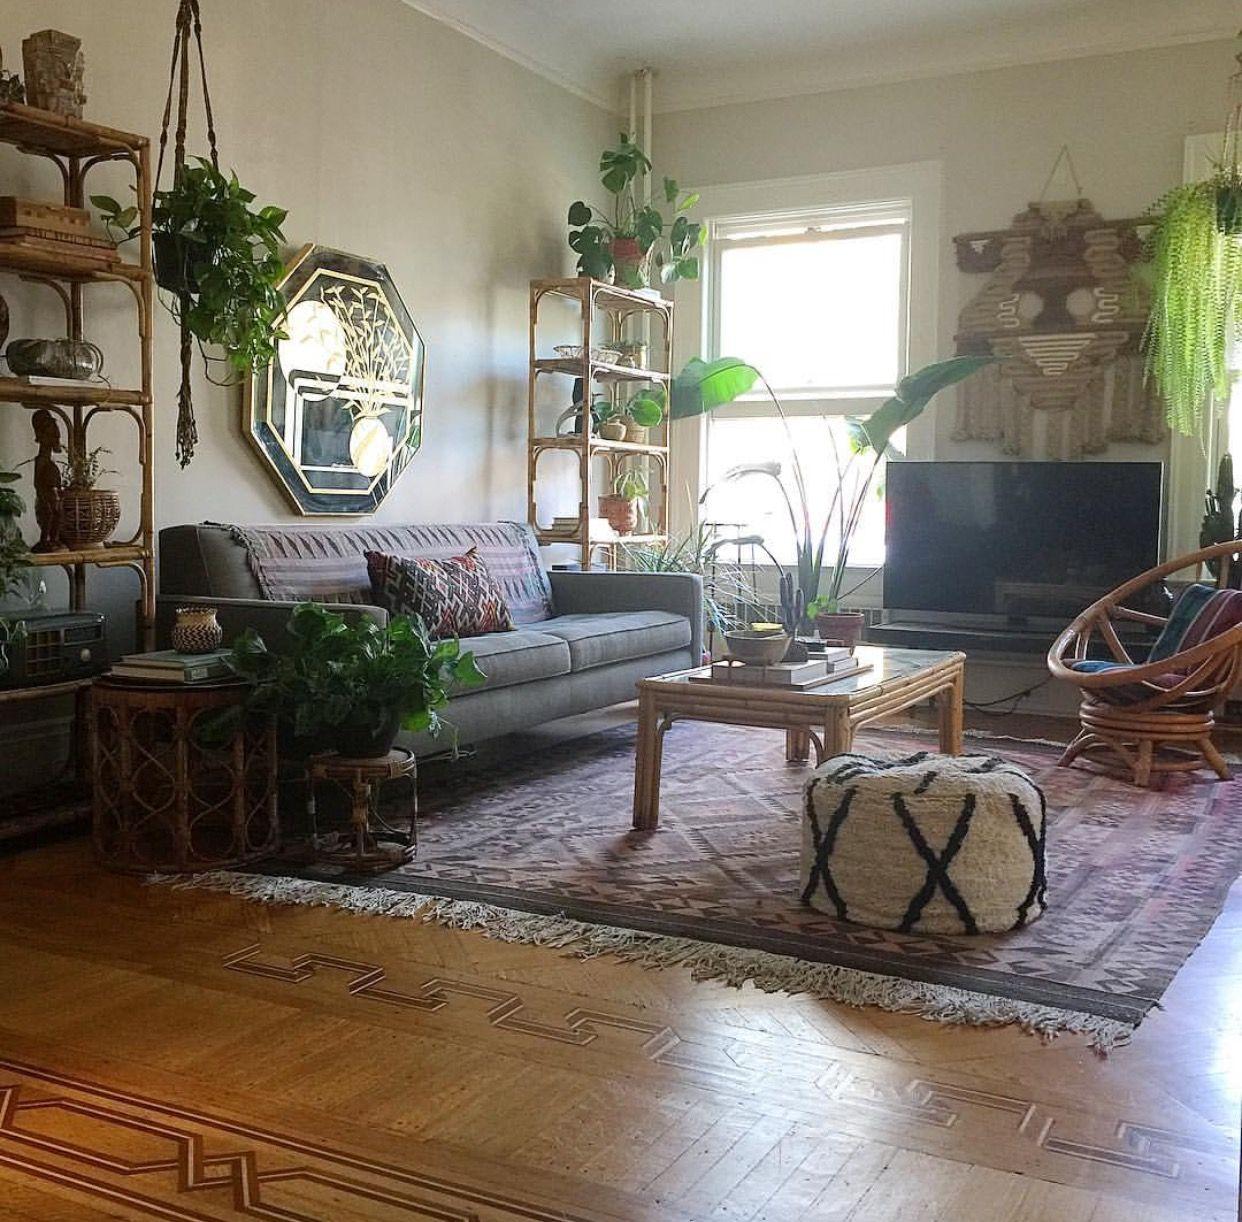 Studio Apartment Home: Pin By Bridget Hughes On Living